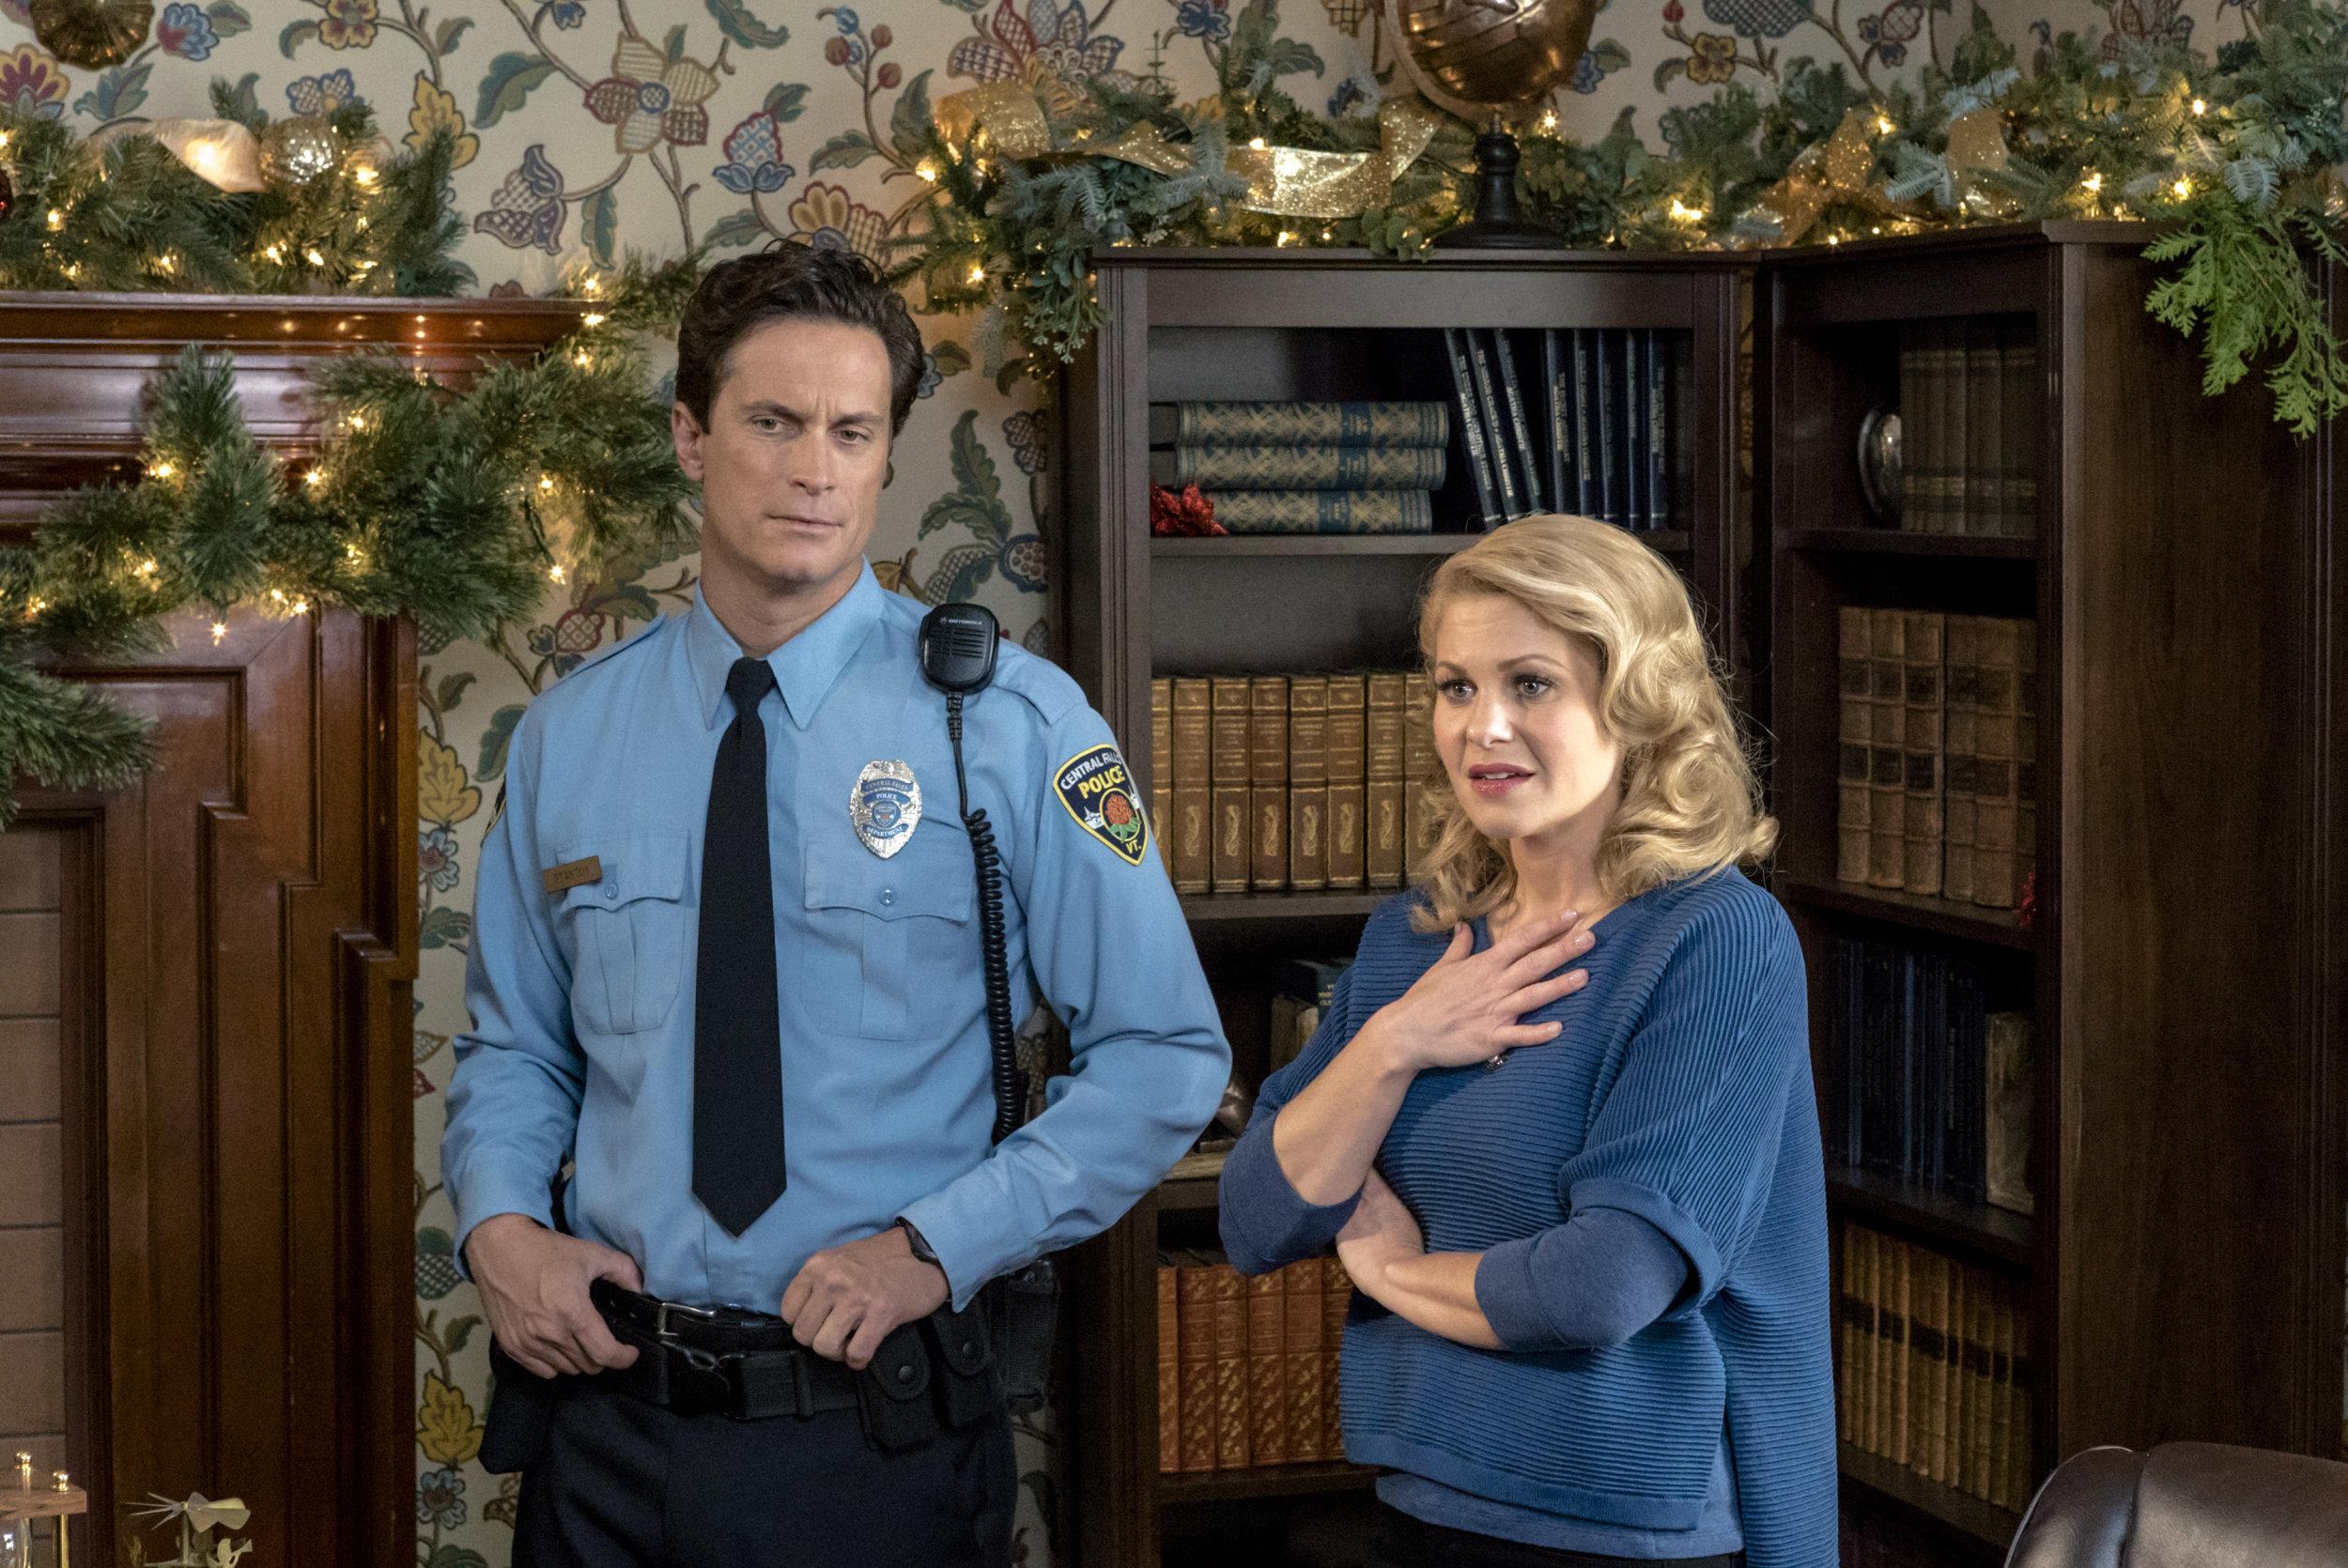 Journey Back to Christmas (TV Movie 2016) - Photo Gallery - IMDb